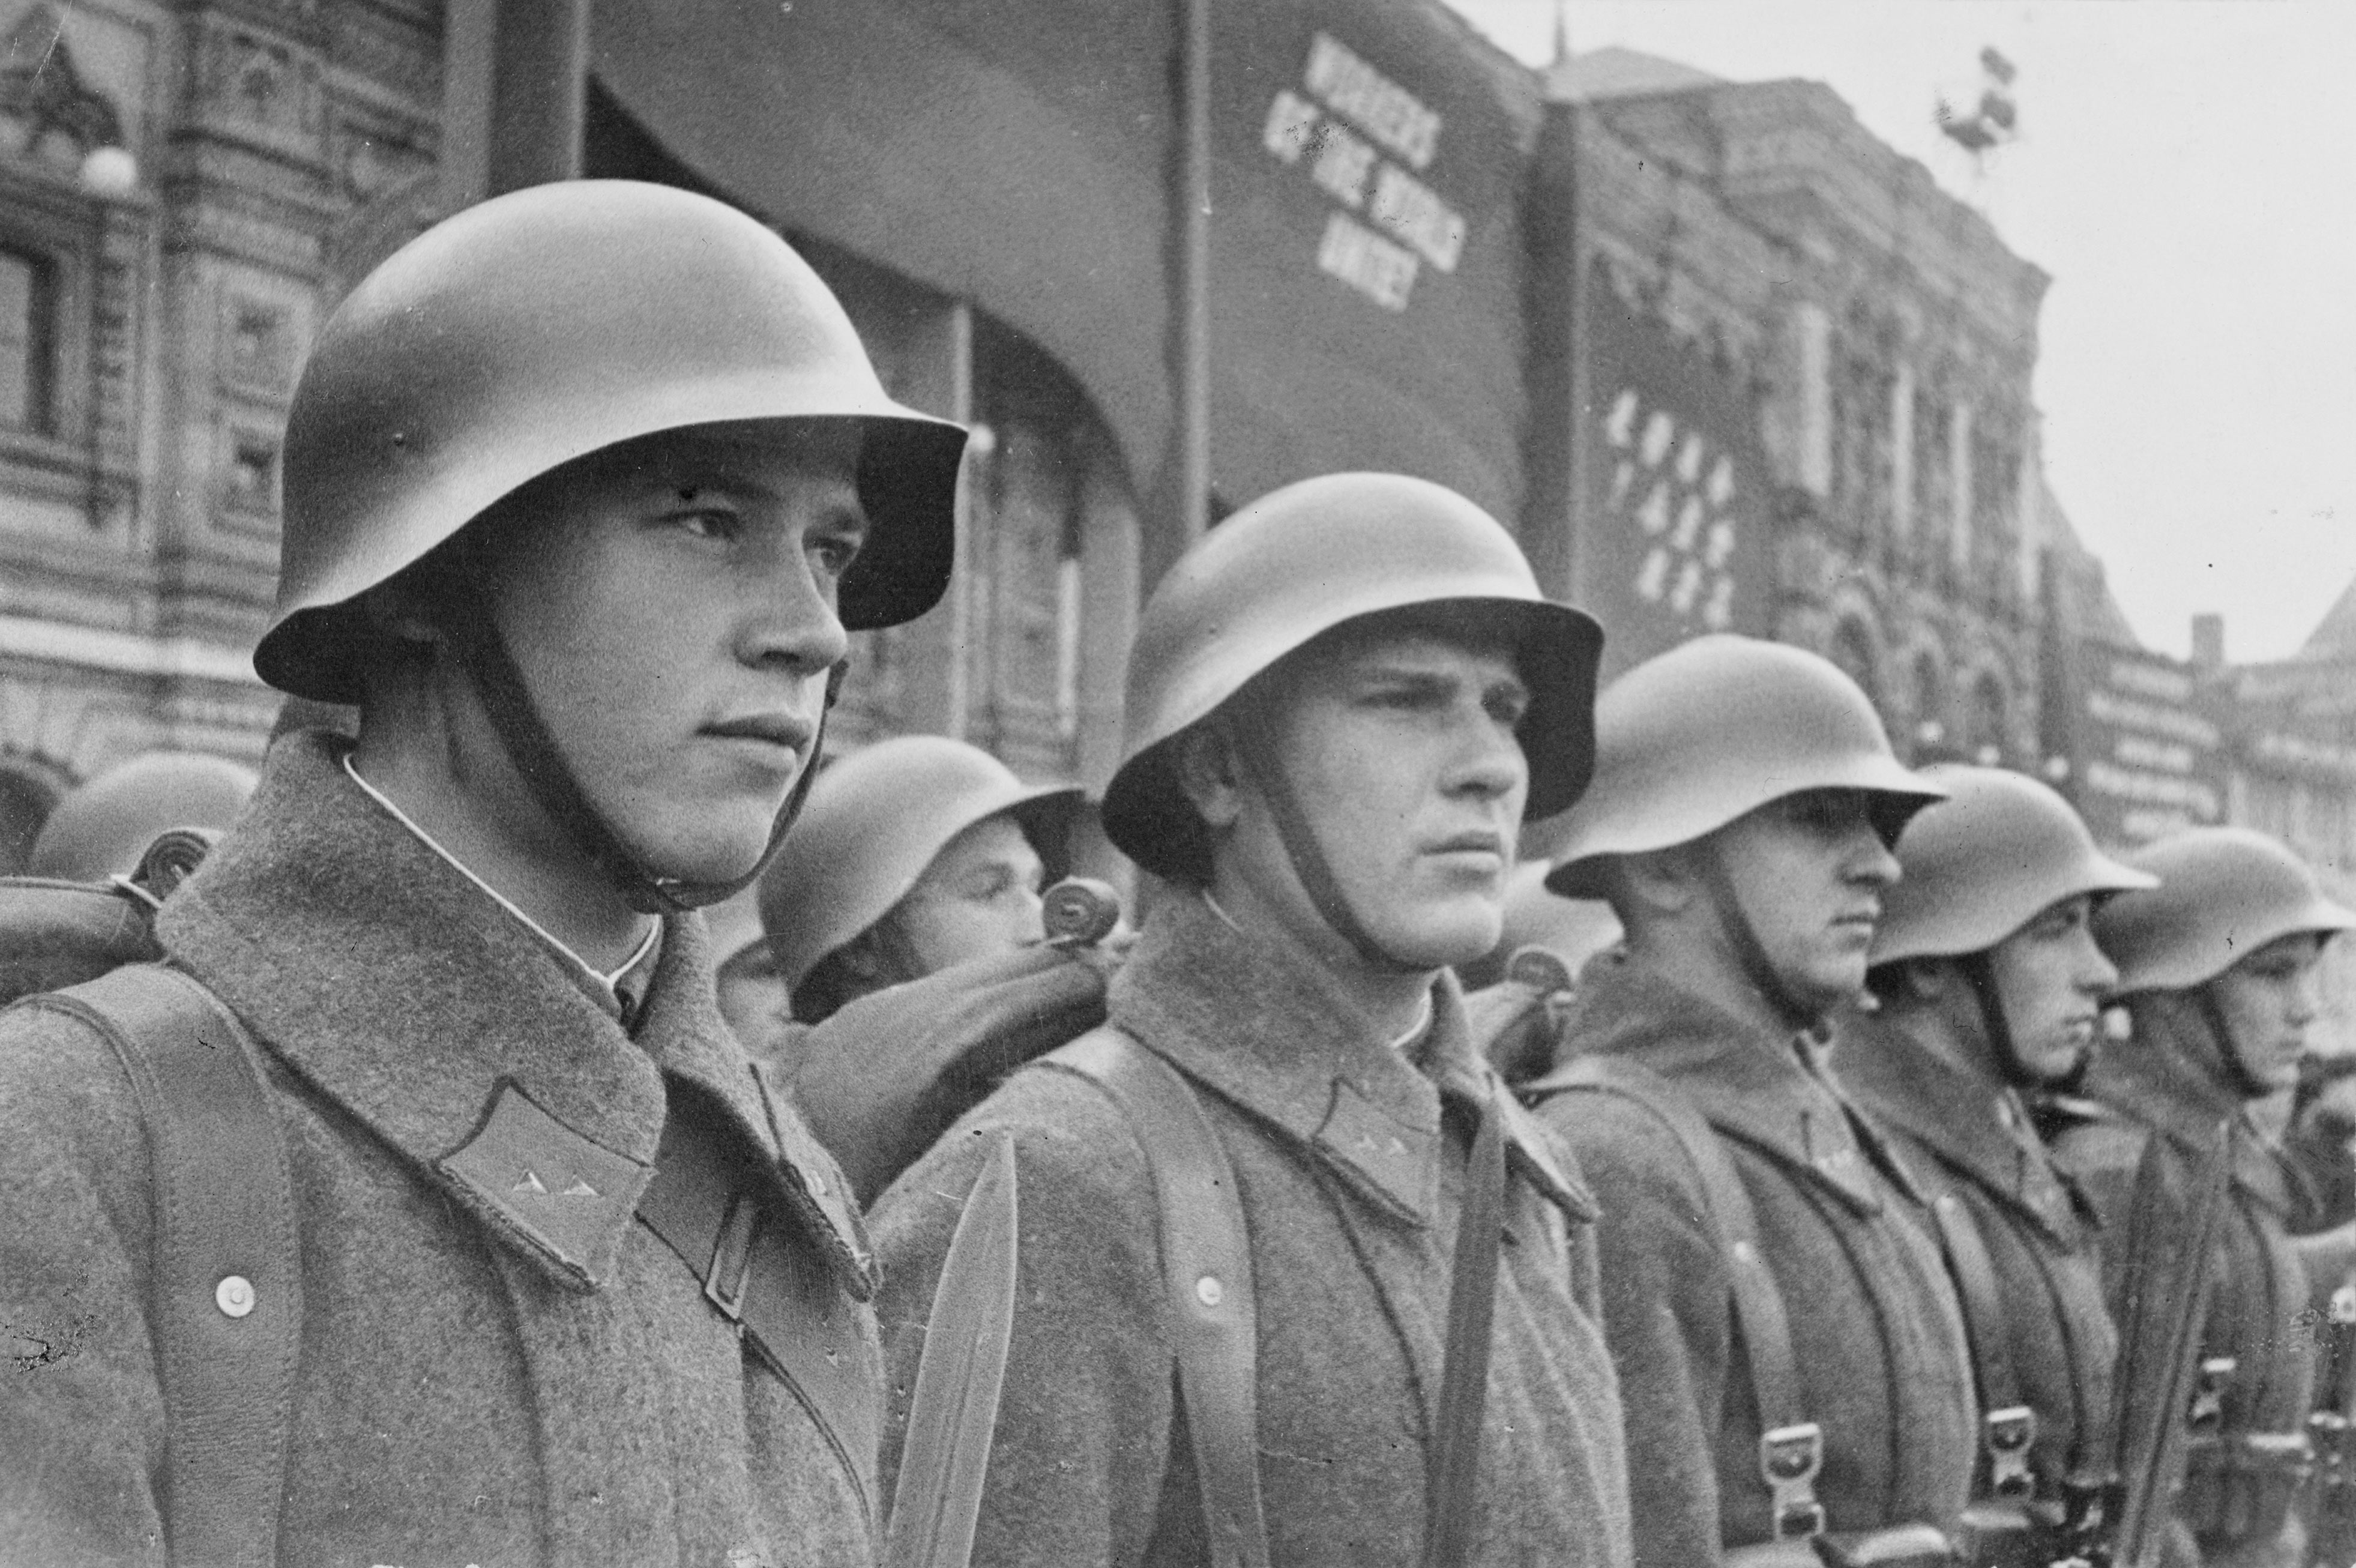 Beschreibung soldaten rote armee